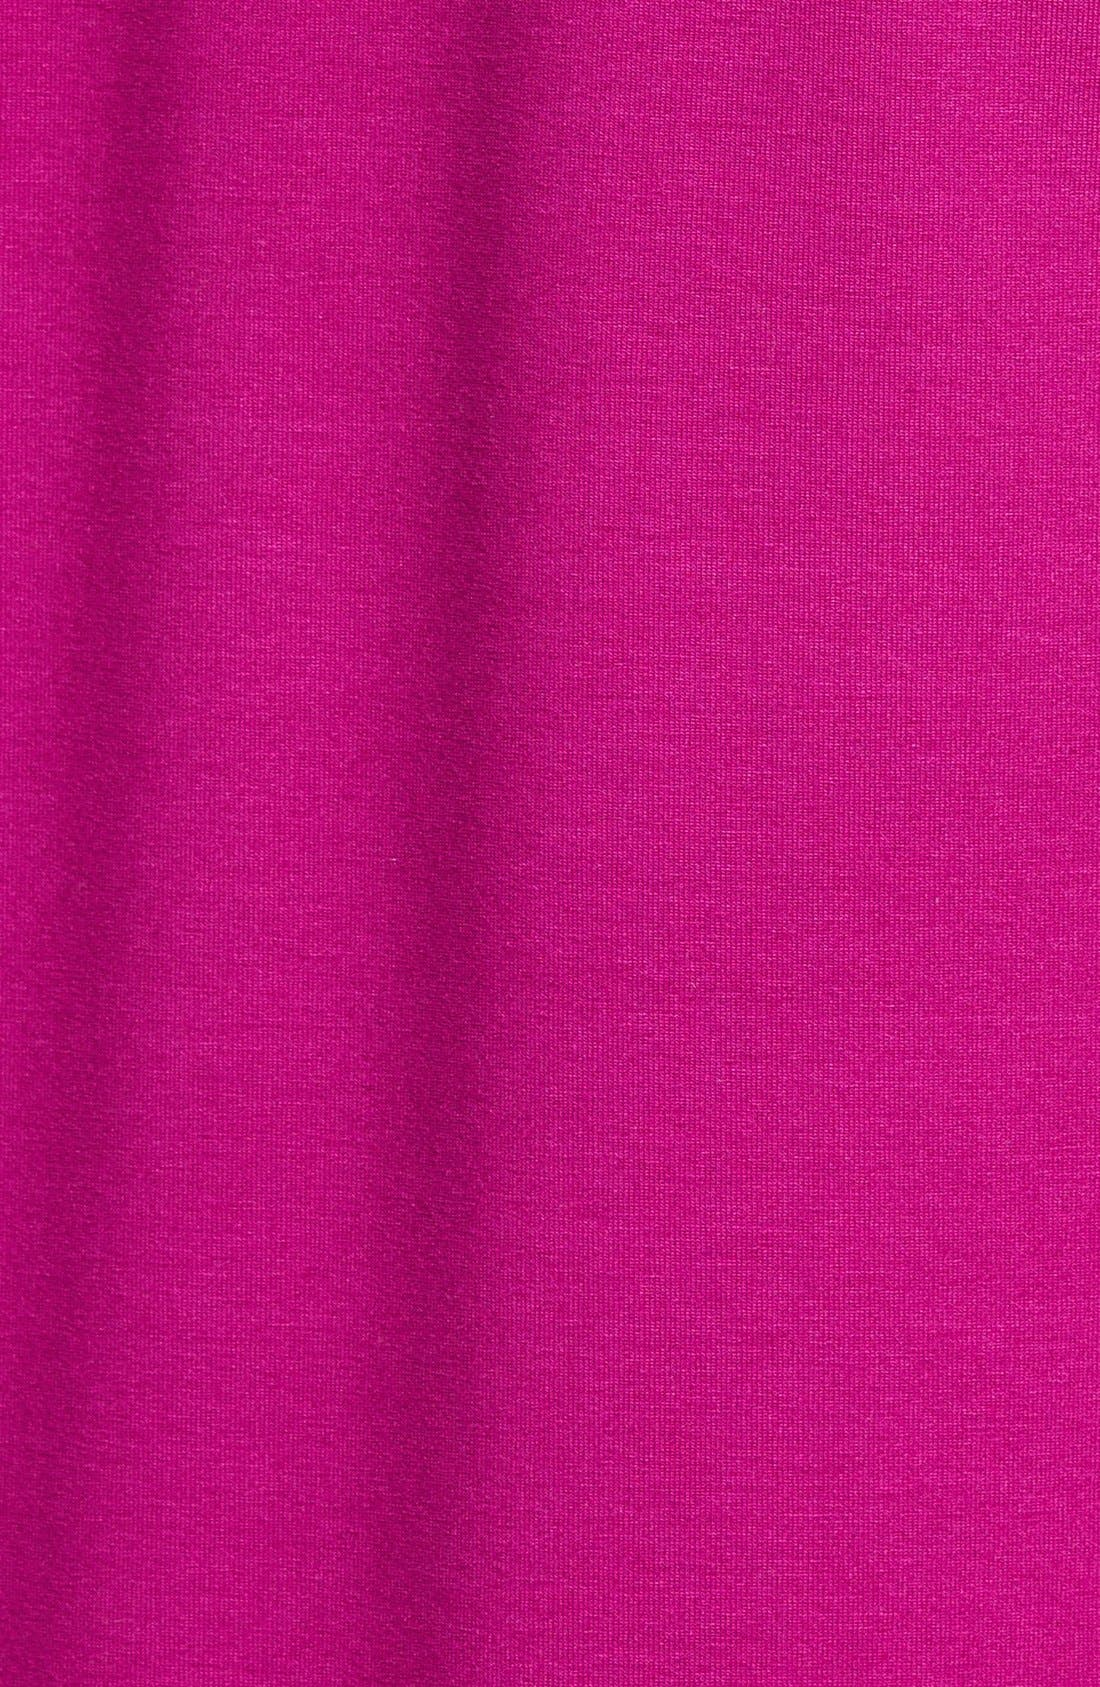 Alternate Image 3  - Eileen Fisher V-Neck Stretch Knit Top (Regular & Petite)